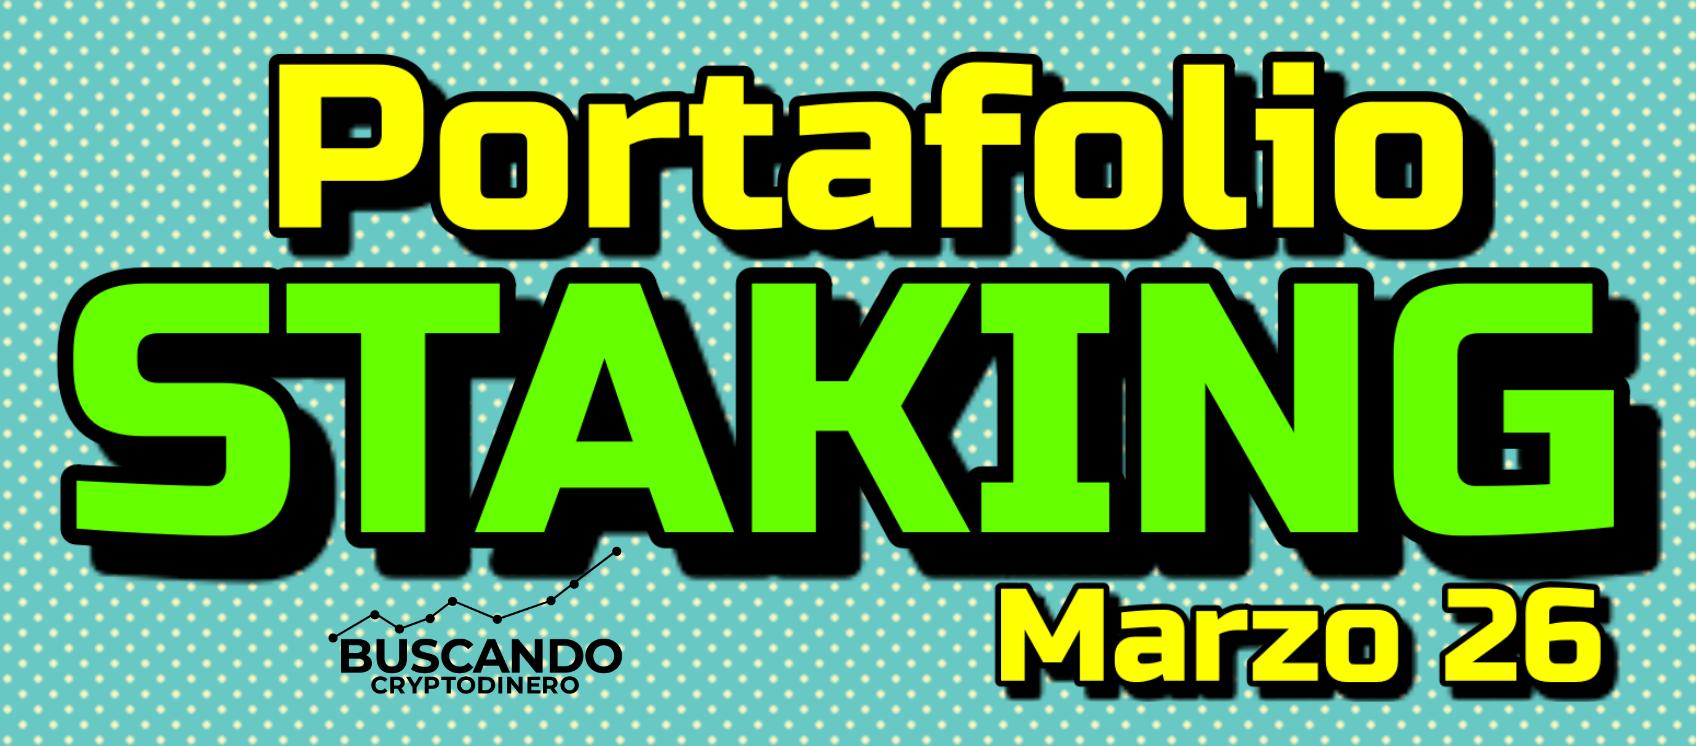 En este momento estás viendo Portafolio STAKING Marzo 26 x 2021 !!!!